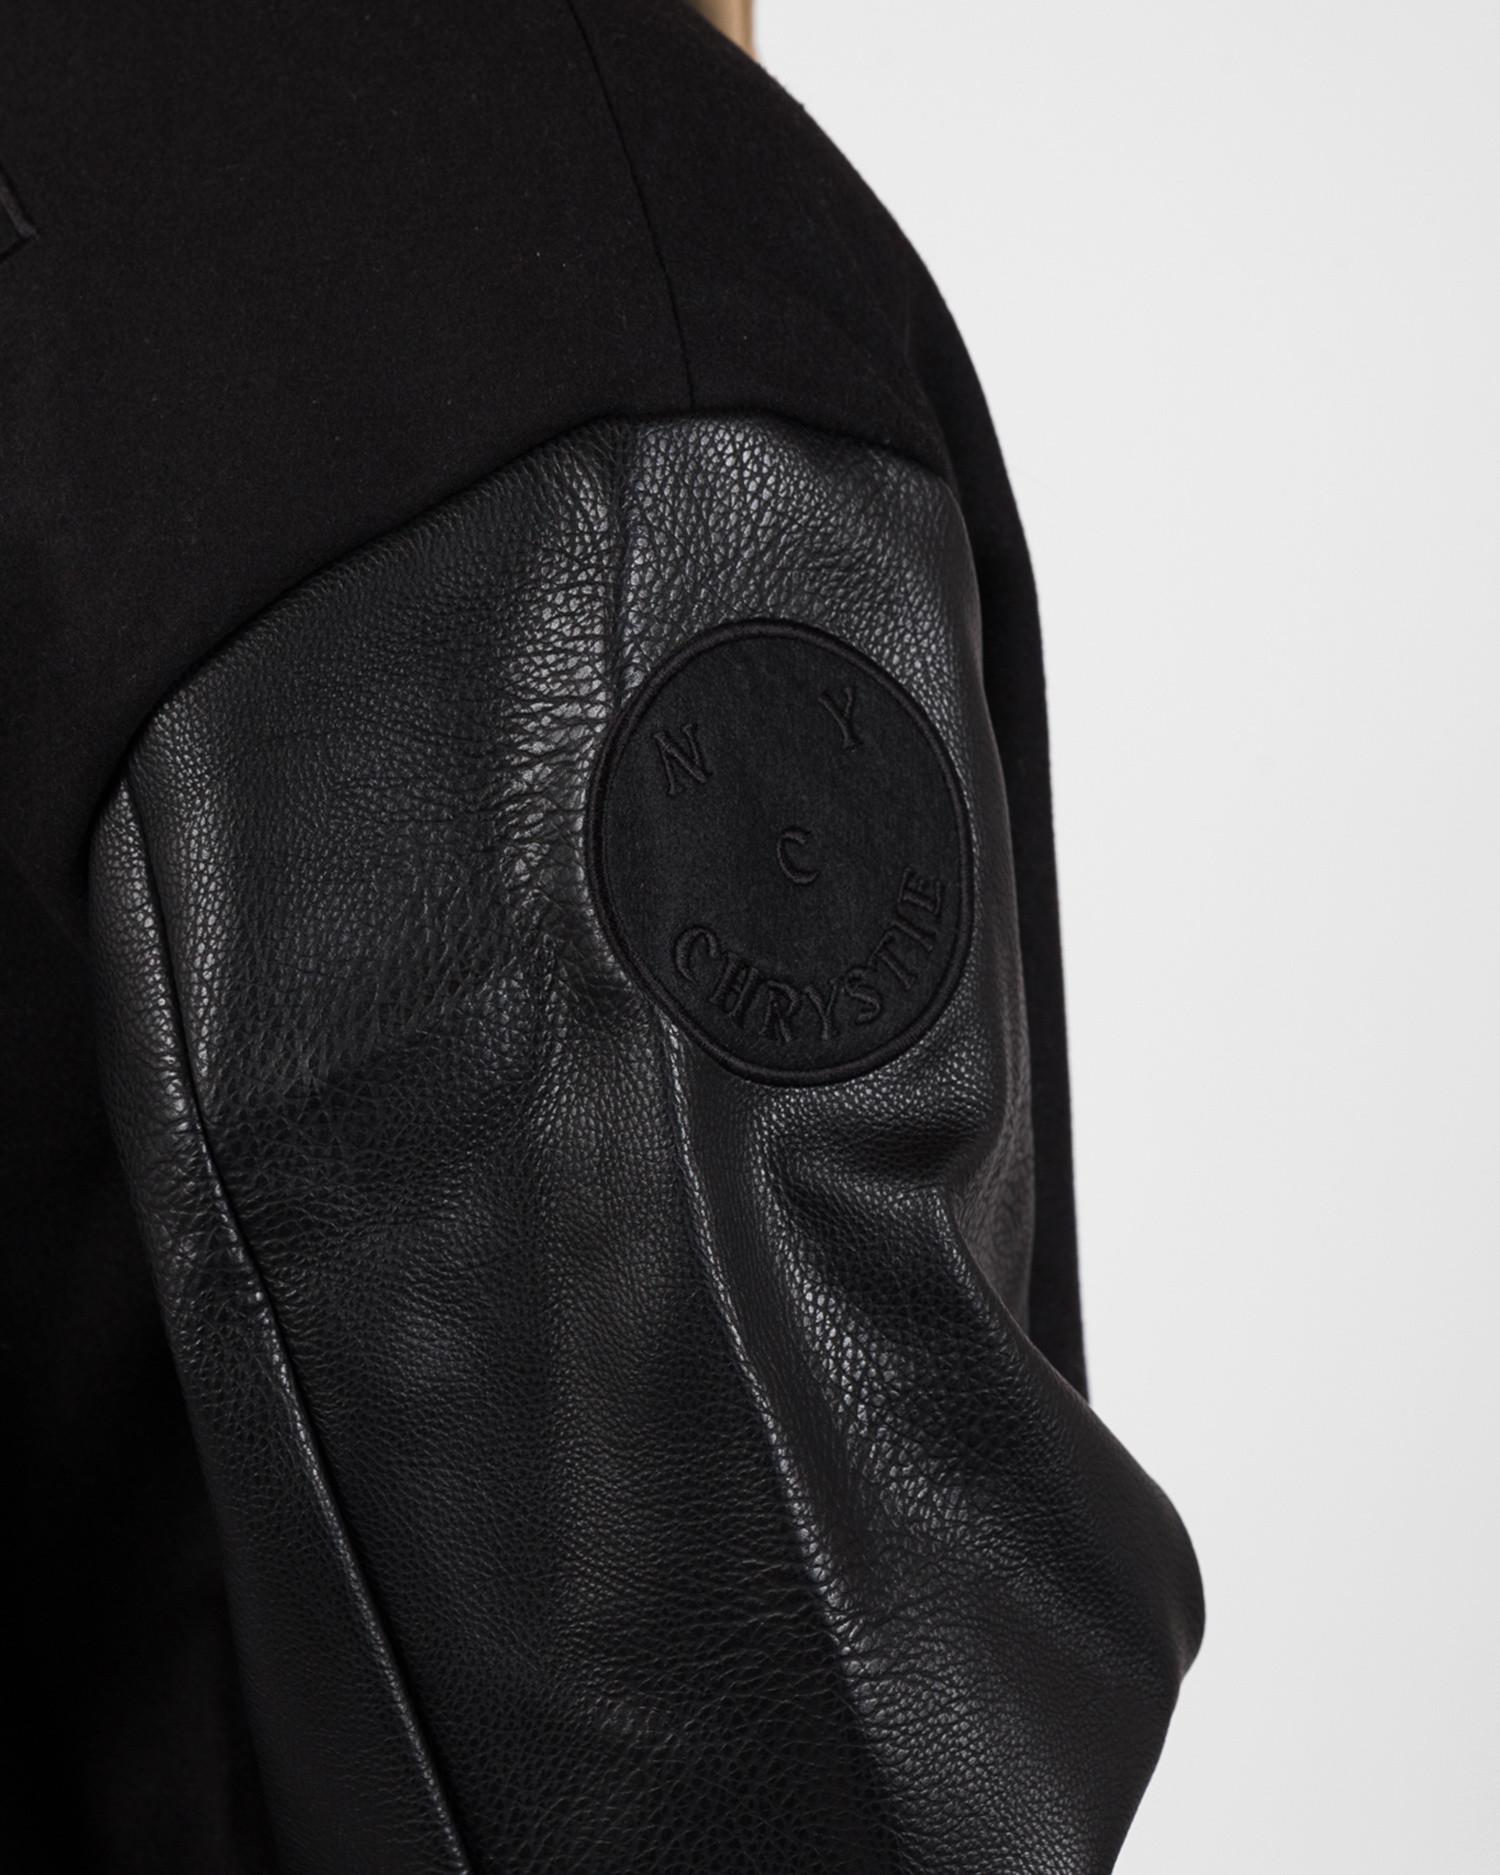 Chrystie NYC  Prm Varasity Leather/Wool Jacket Black